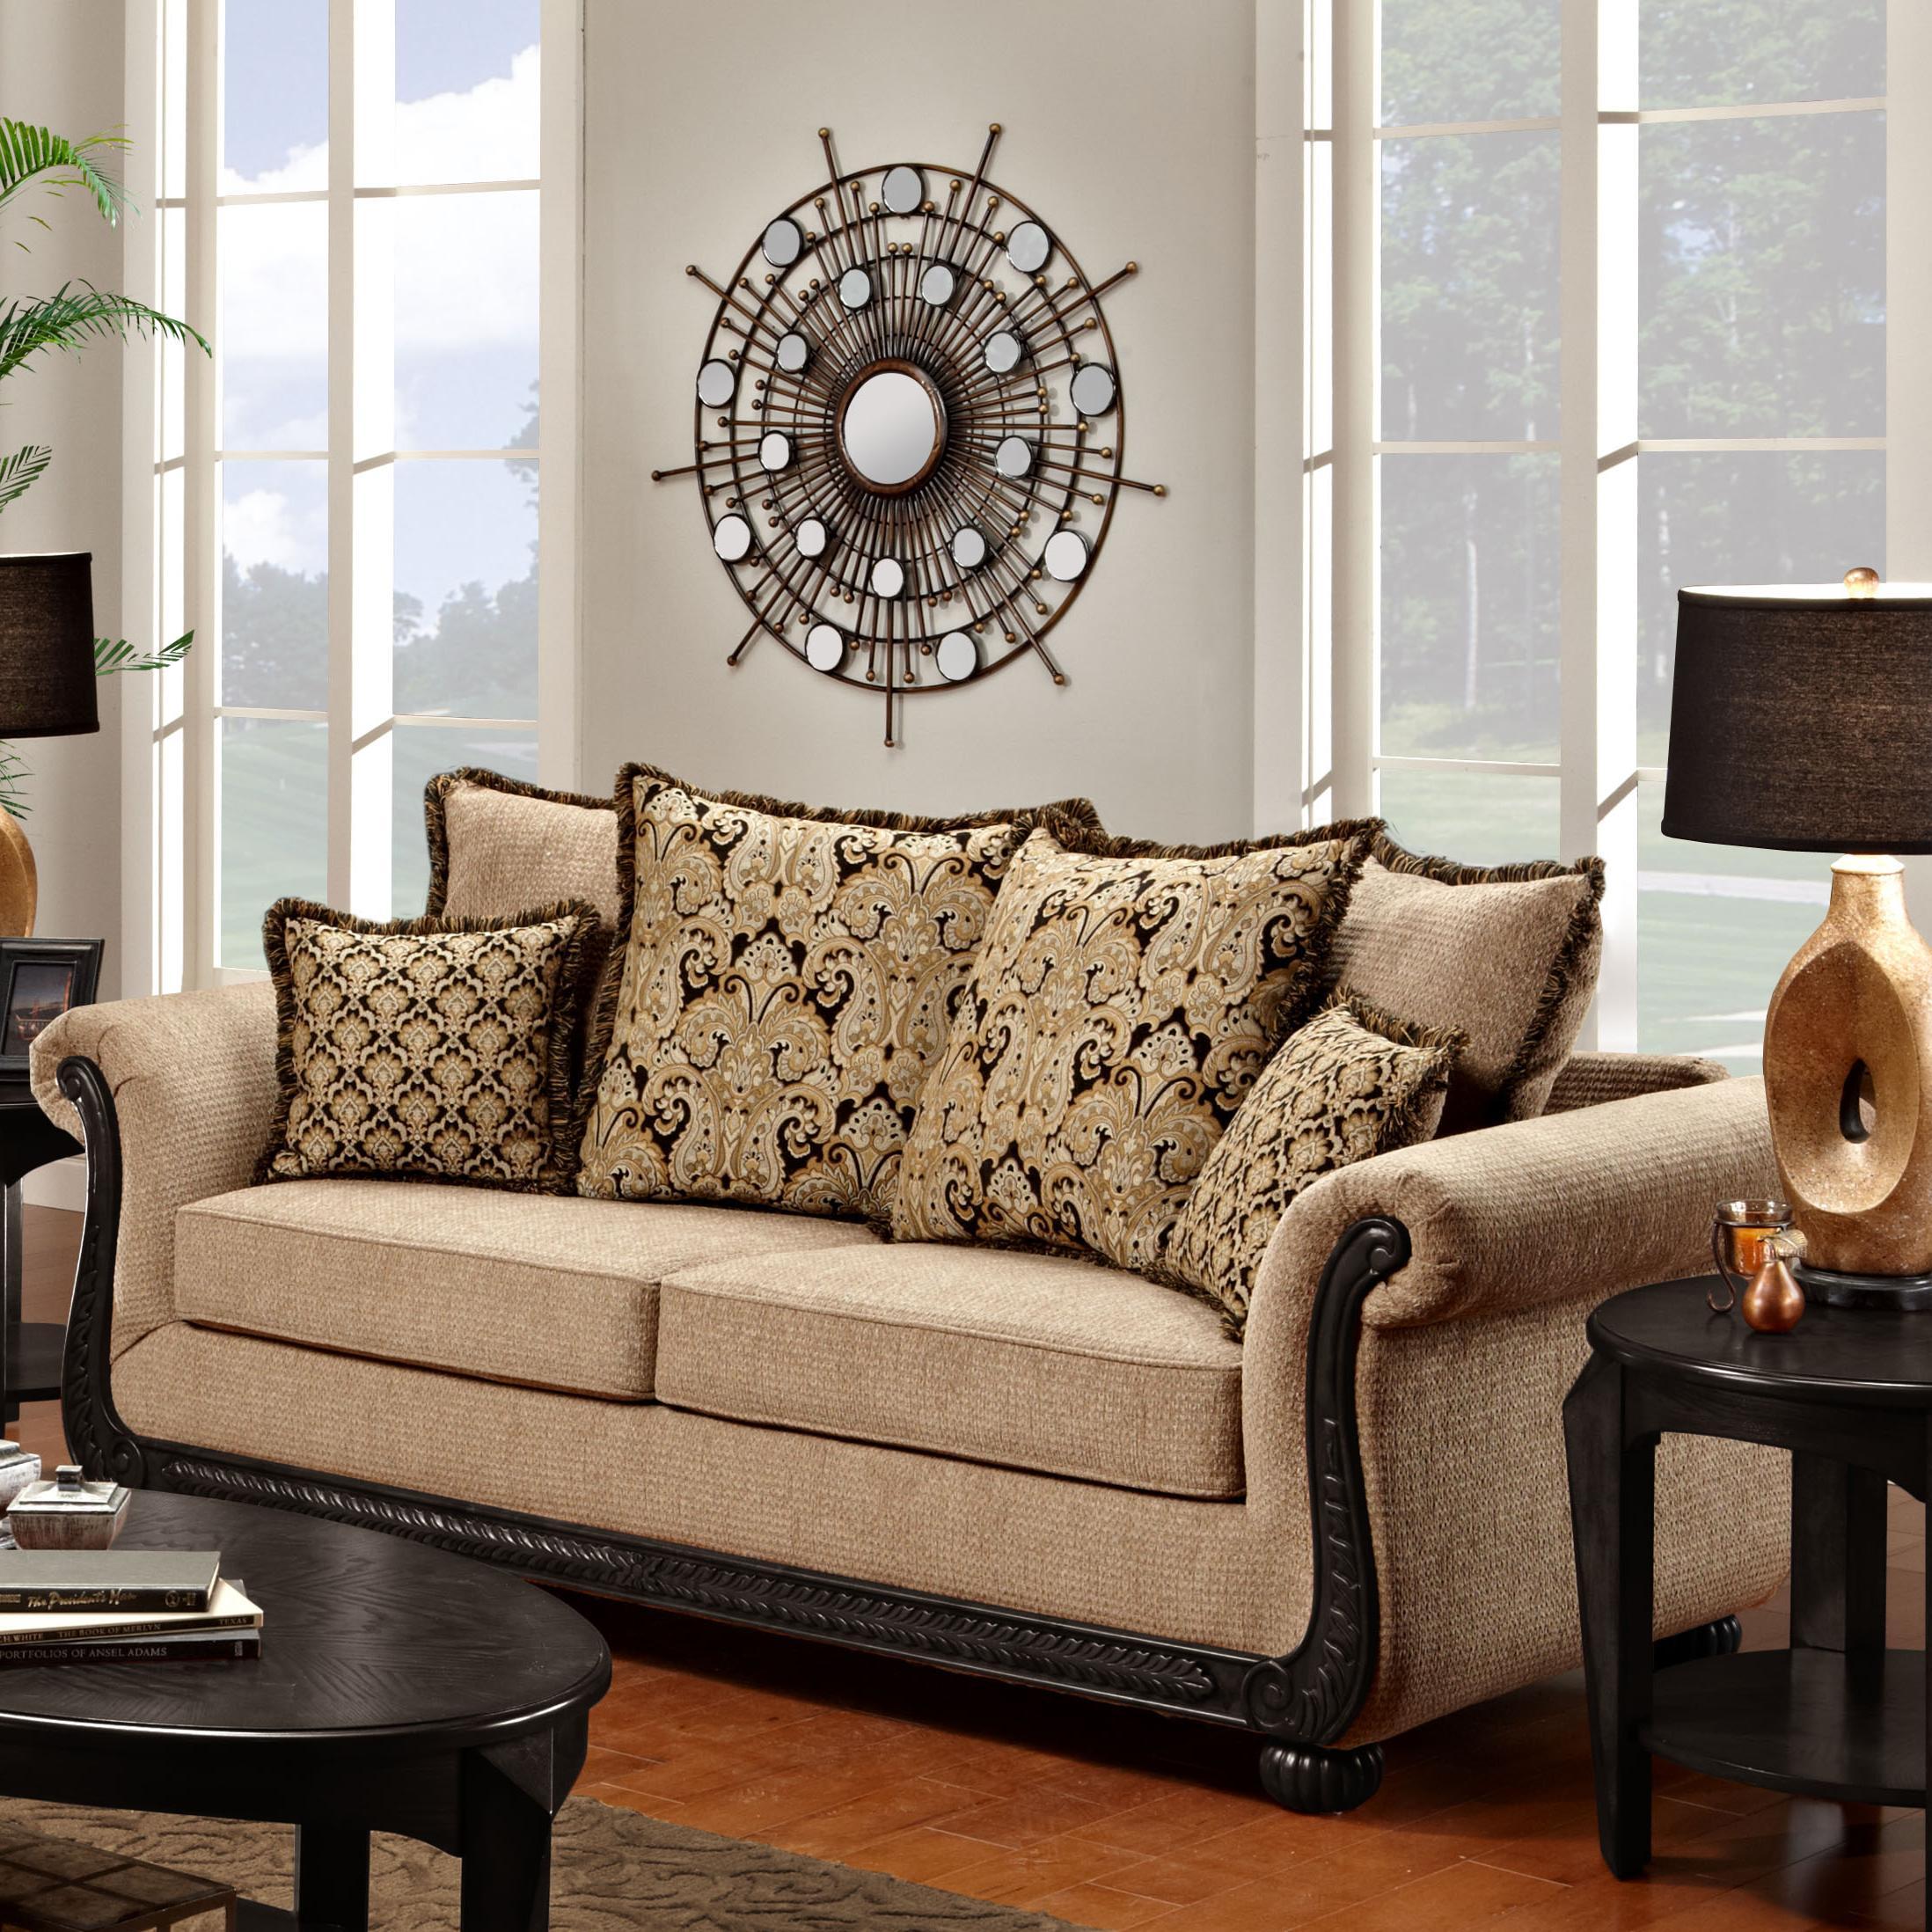 Washington Furniture 6000 Traditional Sofa - Item Number: 6000-S